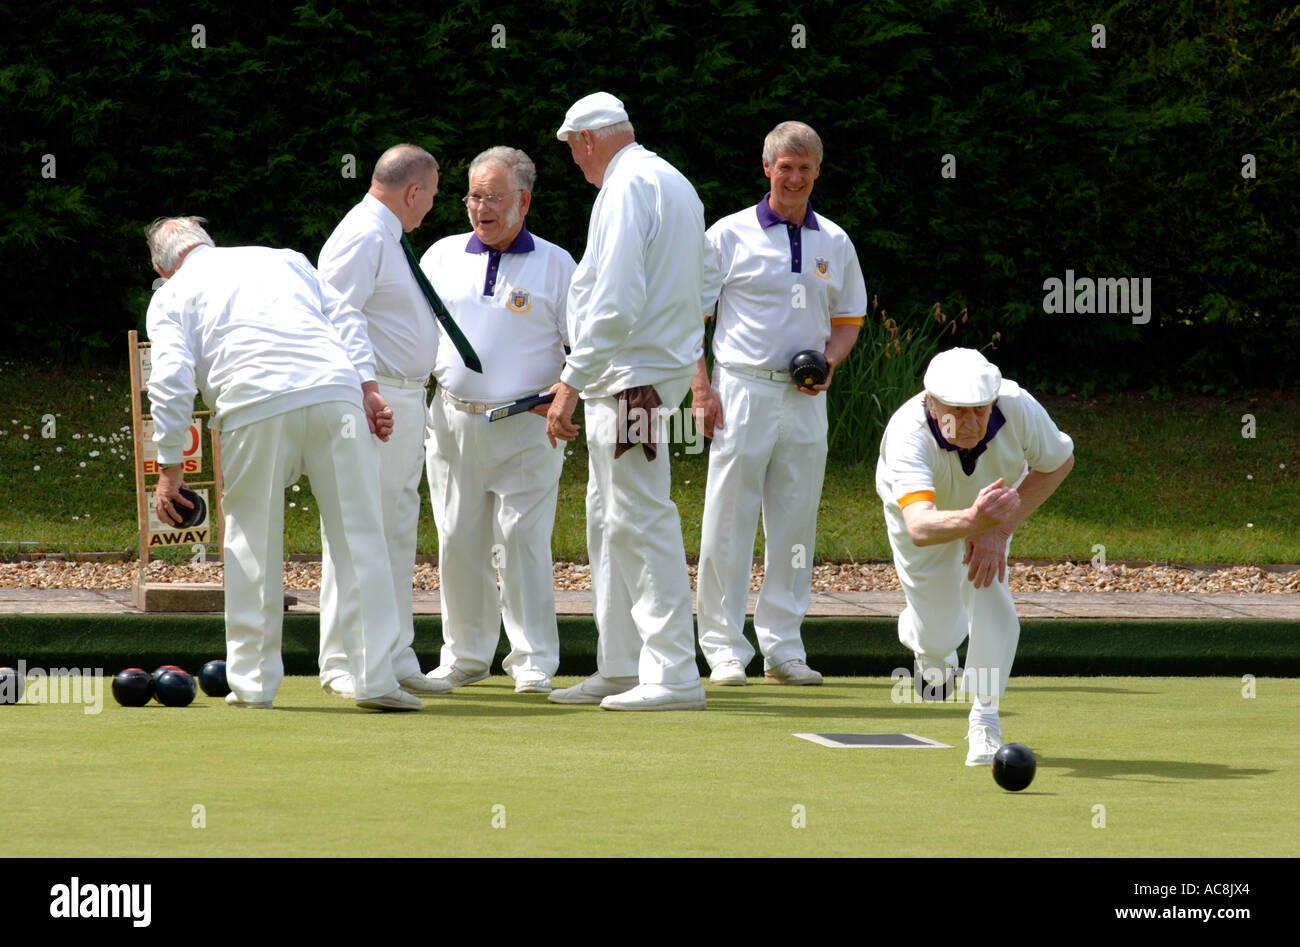 Bowls, Lawn bowls sport, Britain UK - Stock Image